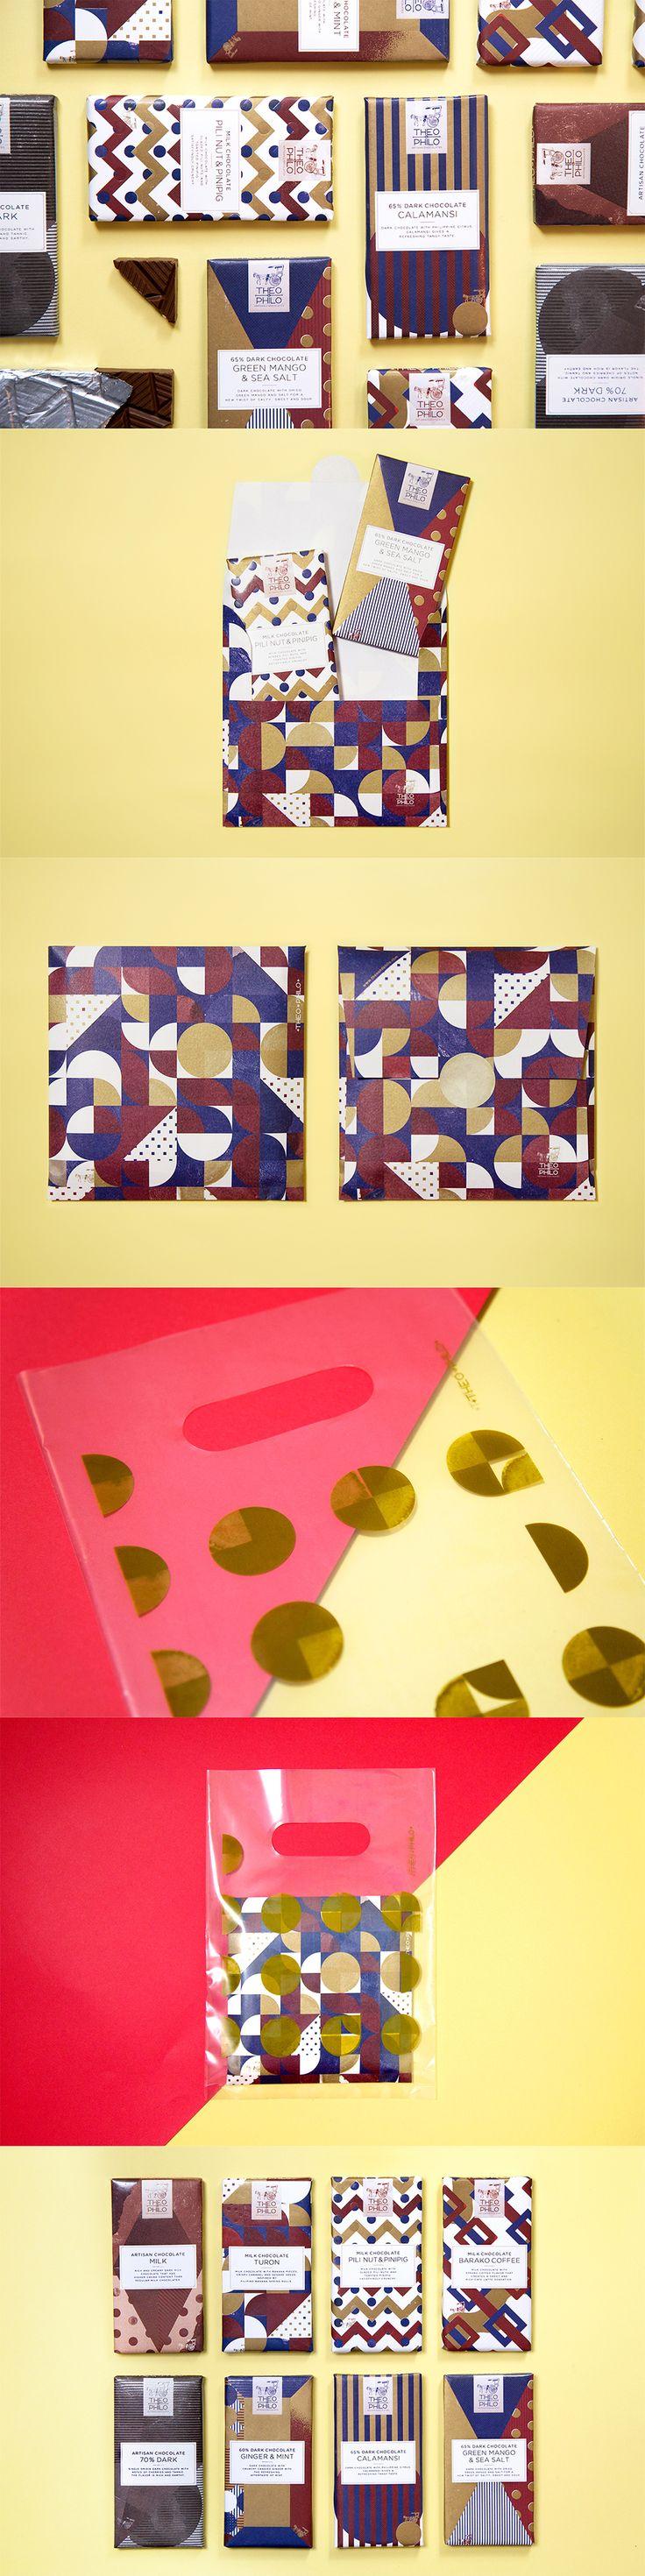 Theo & Philo Chocolate Package Design / 石黒 篤史 / Atsushi Ishiguro(OUWN)